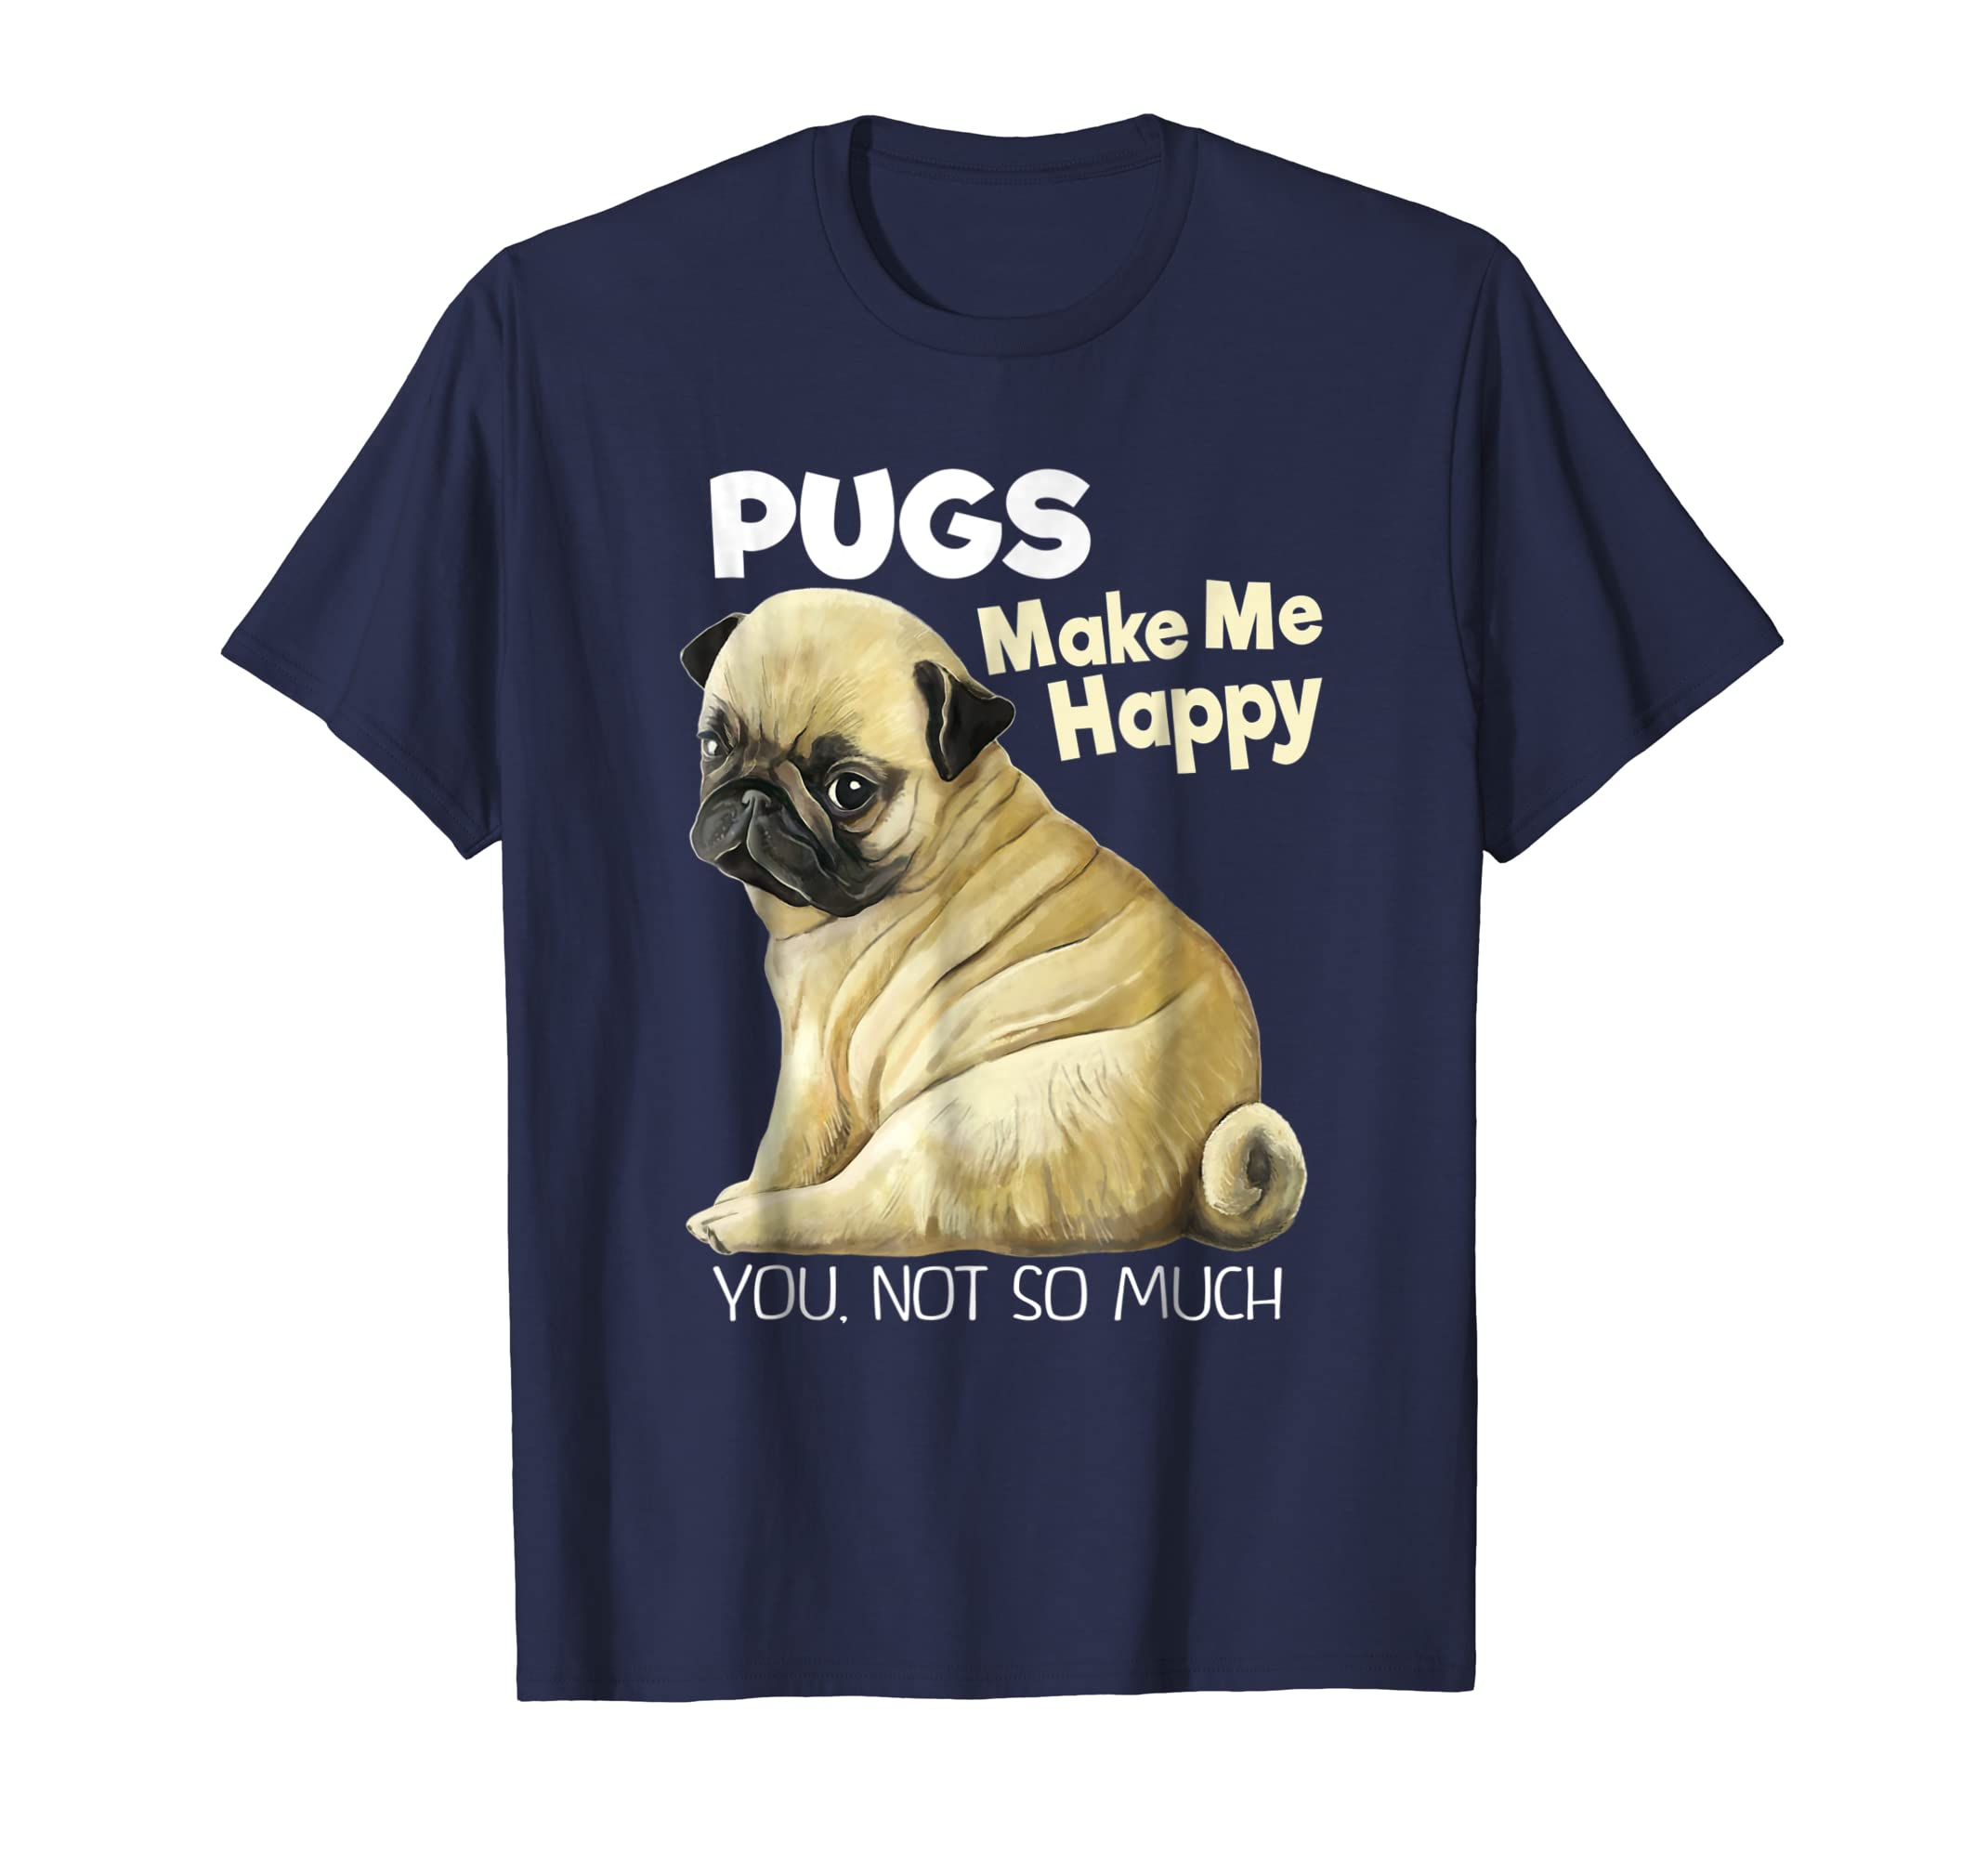 81442b205 Amazon.com: Pug Shirt - Funny T-shirt Pugs Make Me Happy You Not So Much:  Clothing